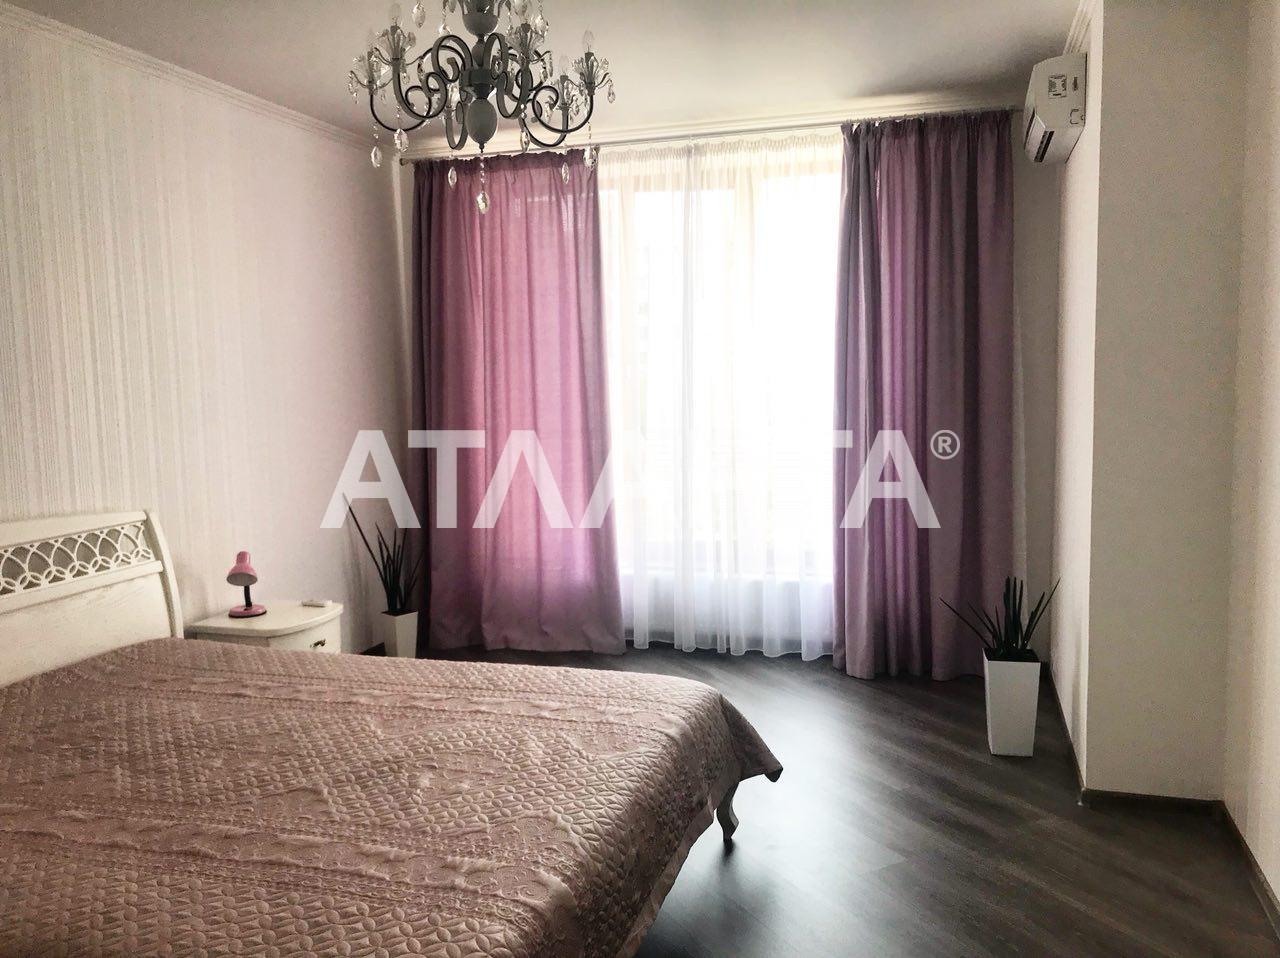 Продается 1-комнатная Квартира на ул. Говорова Марш. — 110 000 у.е. (фото №3)